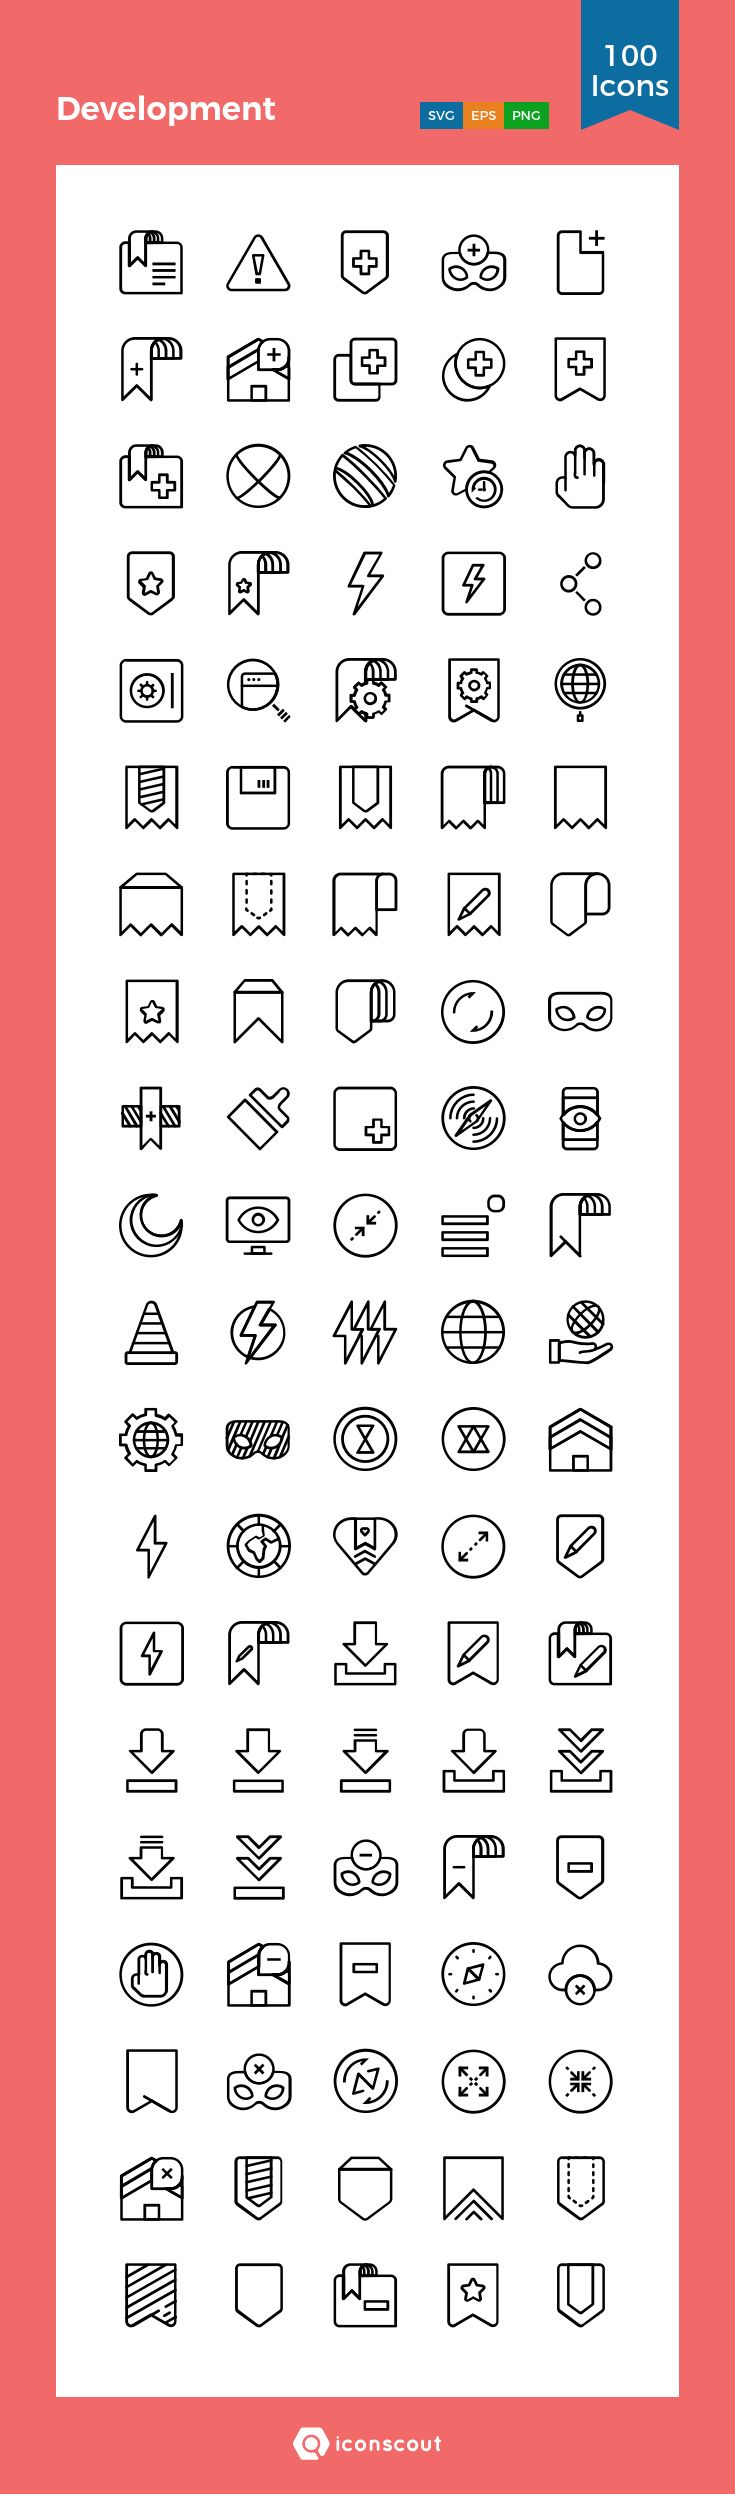 Development   Icon Pack - 100 Line Icons